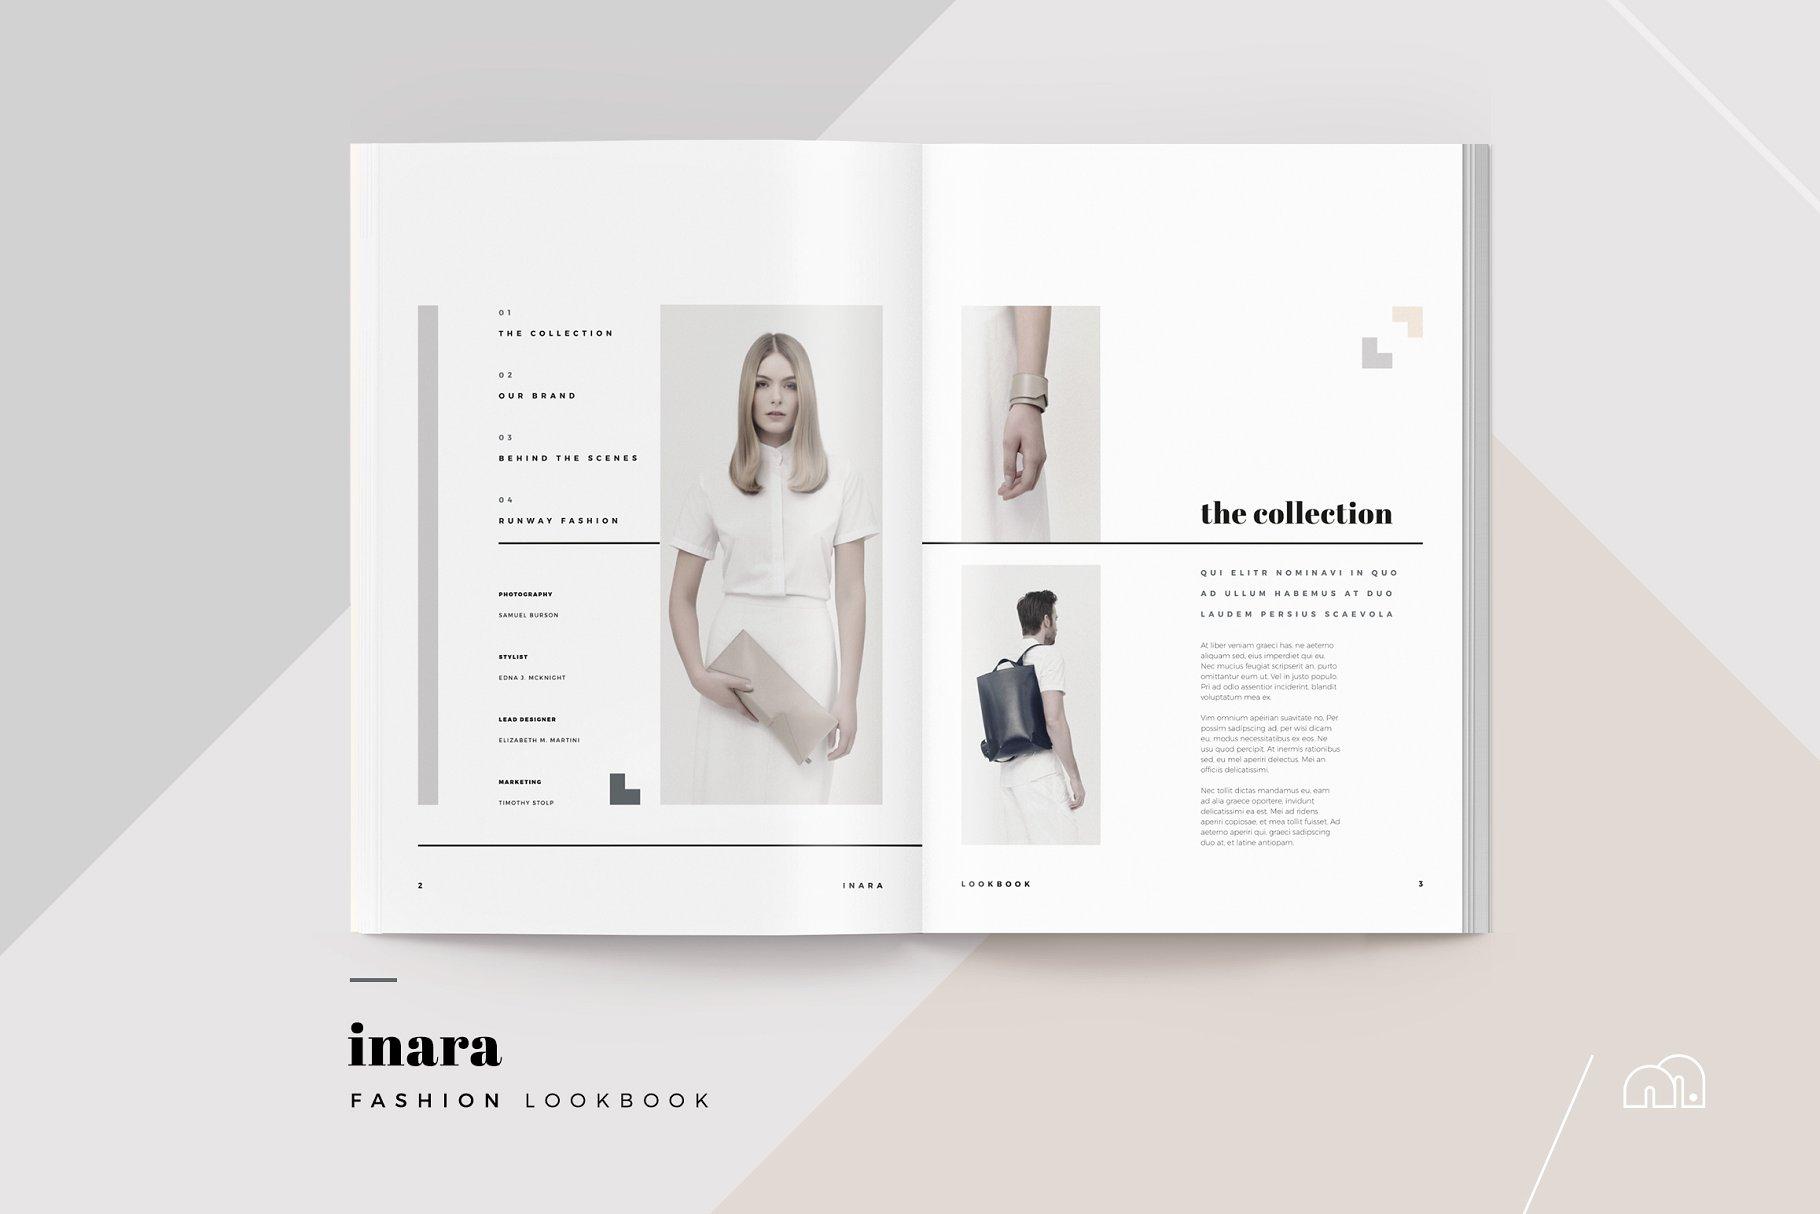 lookbook-inara-preview-4-.jpg